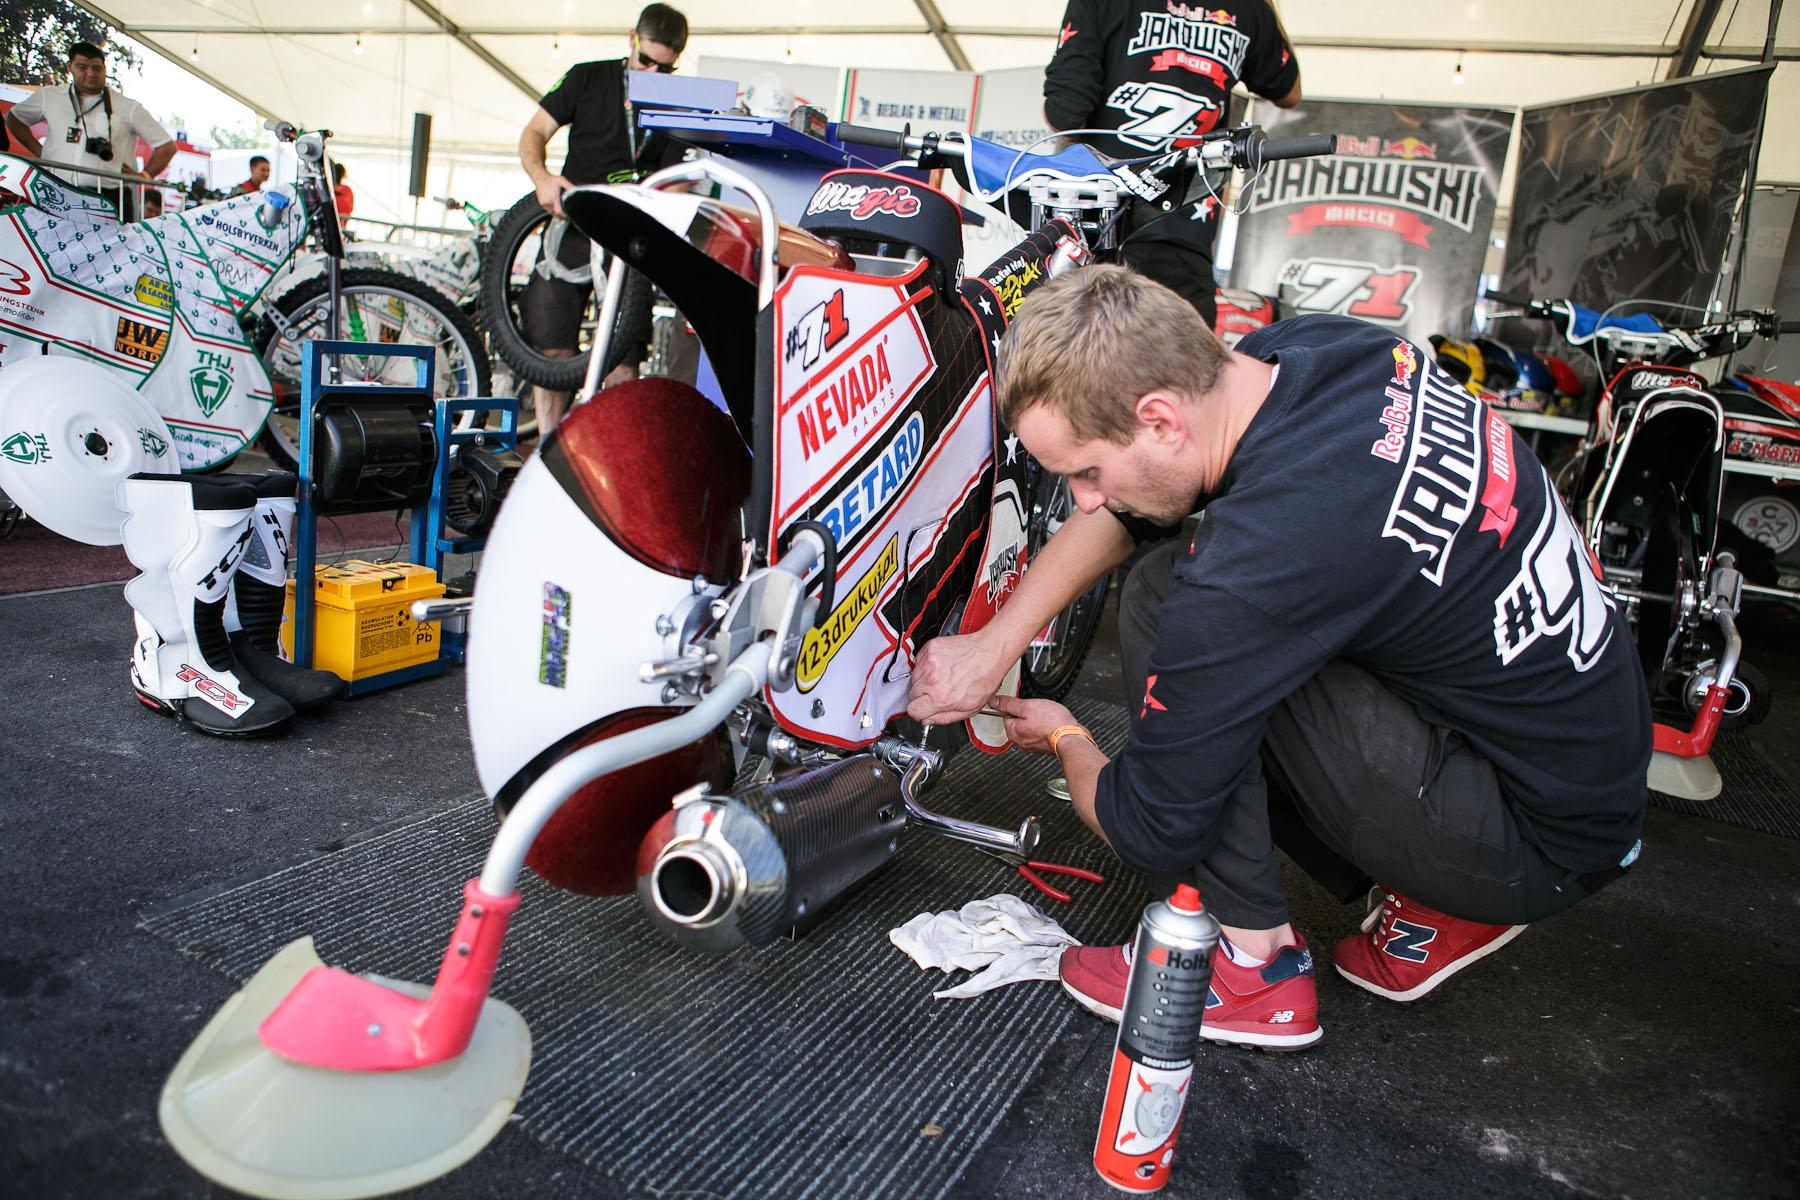 Poland\'s Maciej Janowski\'s technical team prepares the motorcycle before the Mitas Slovenian FIM Speedway Grand Prix at Matija Gubec Stadium in Krsko, Slovenia, Sep. 12, 2015.